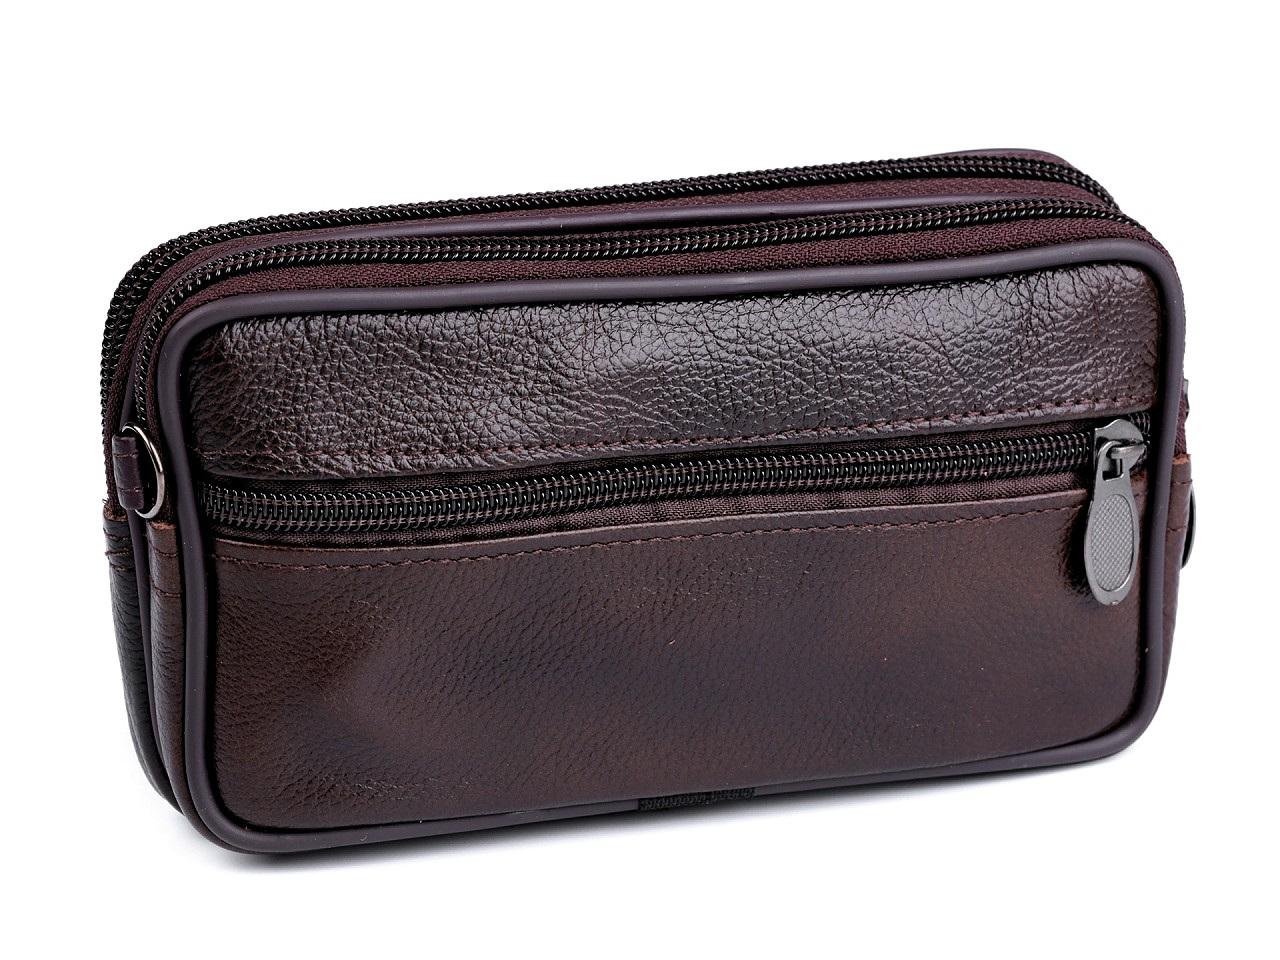 Pánské pouzdro / peněženka na opasek na mobil / doklady, kožené 10x17 cm, barva 1 hnědá